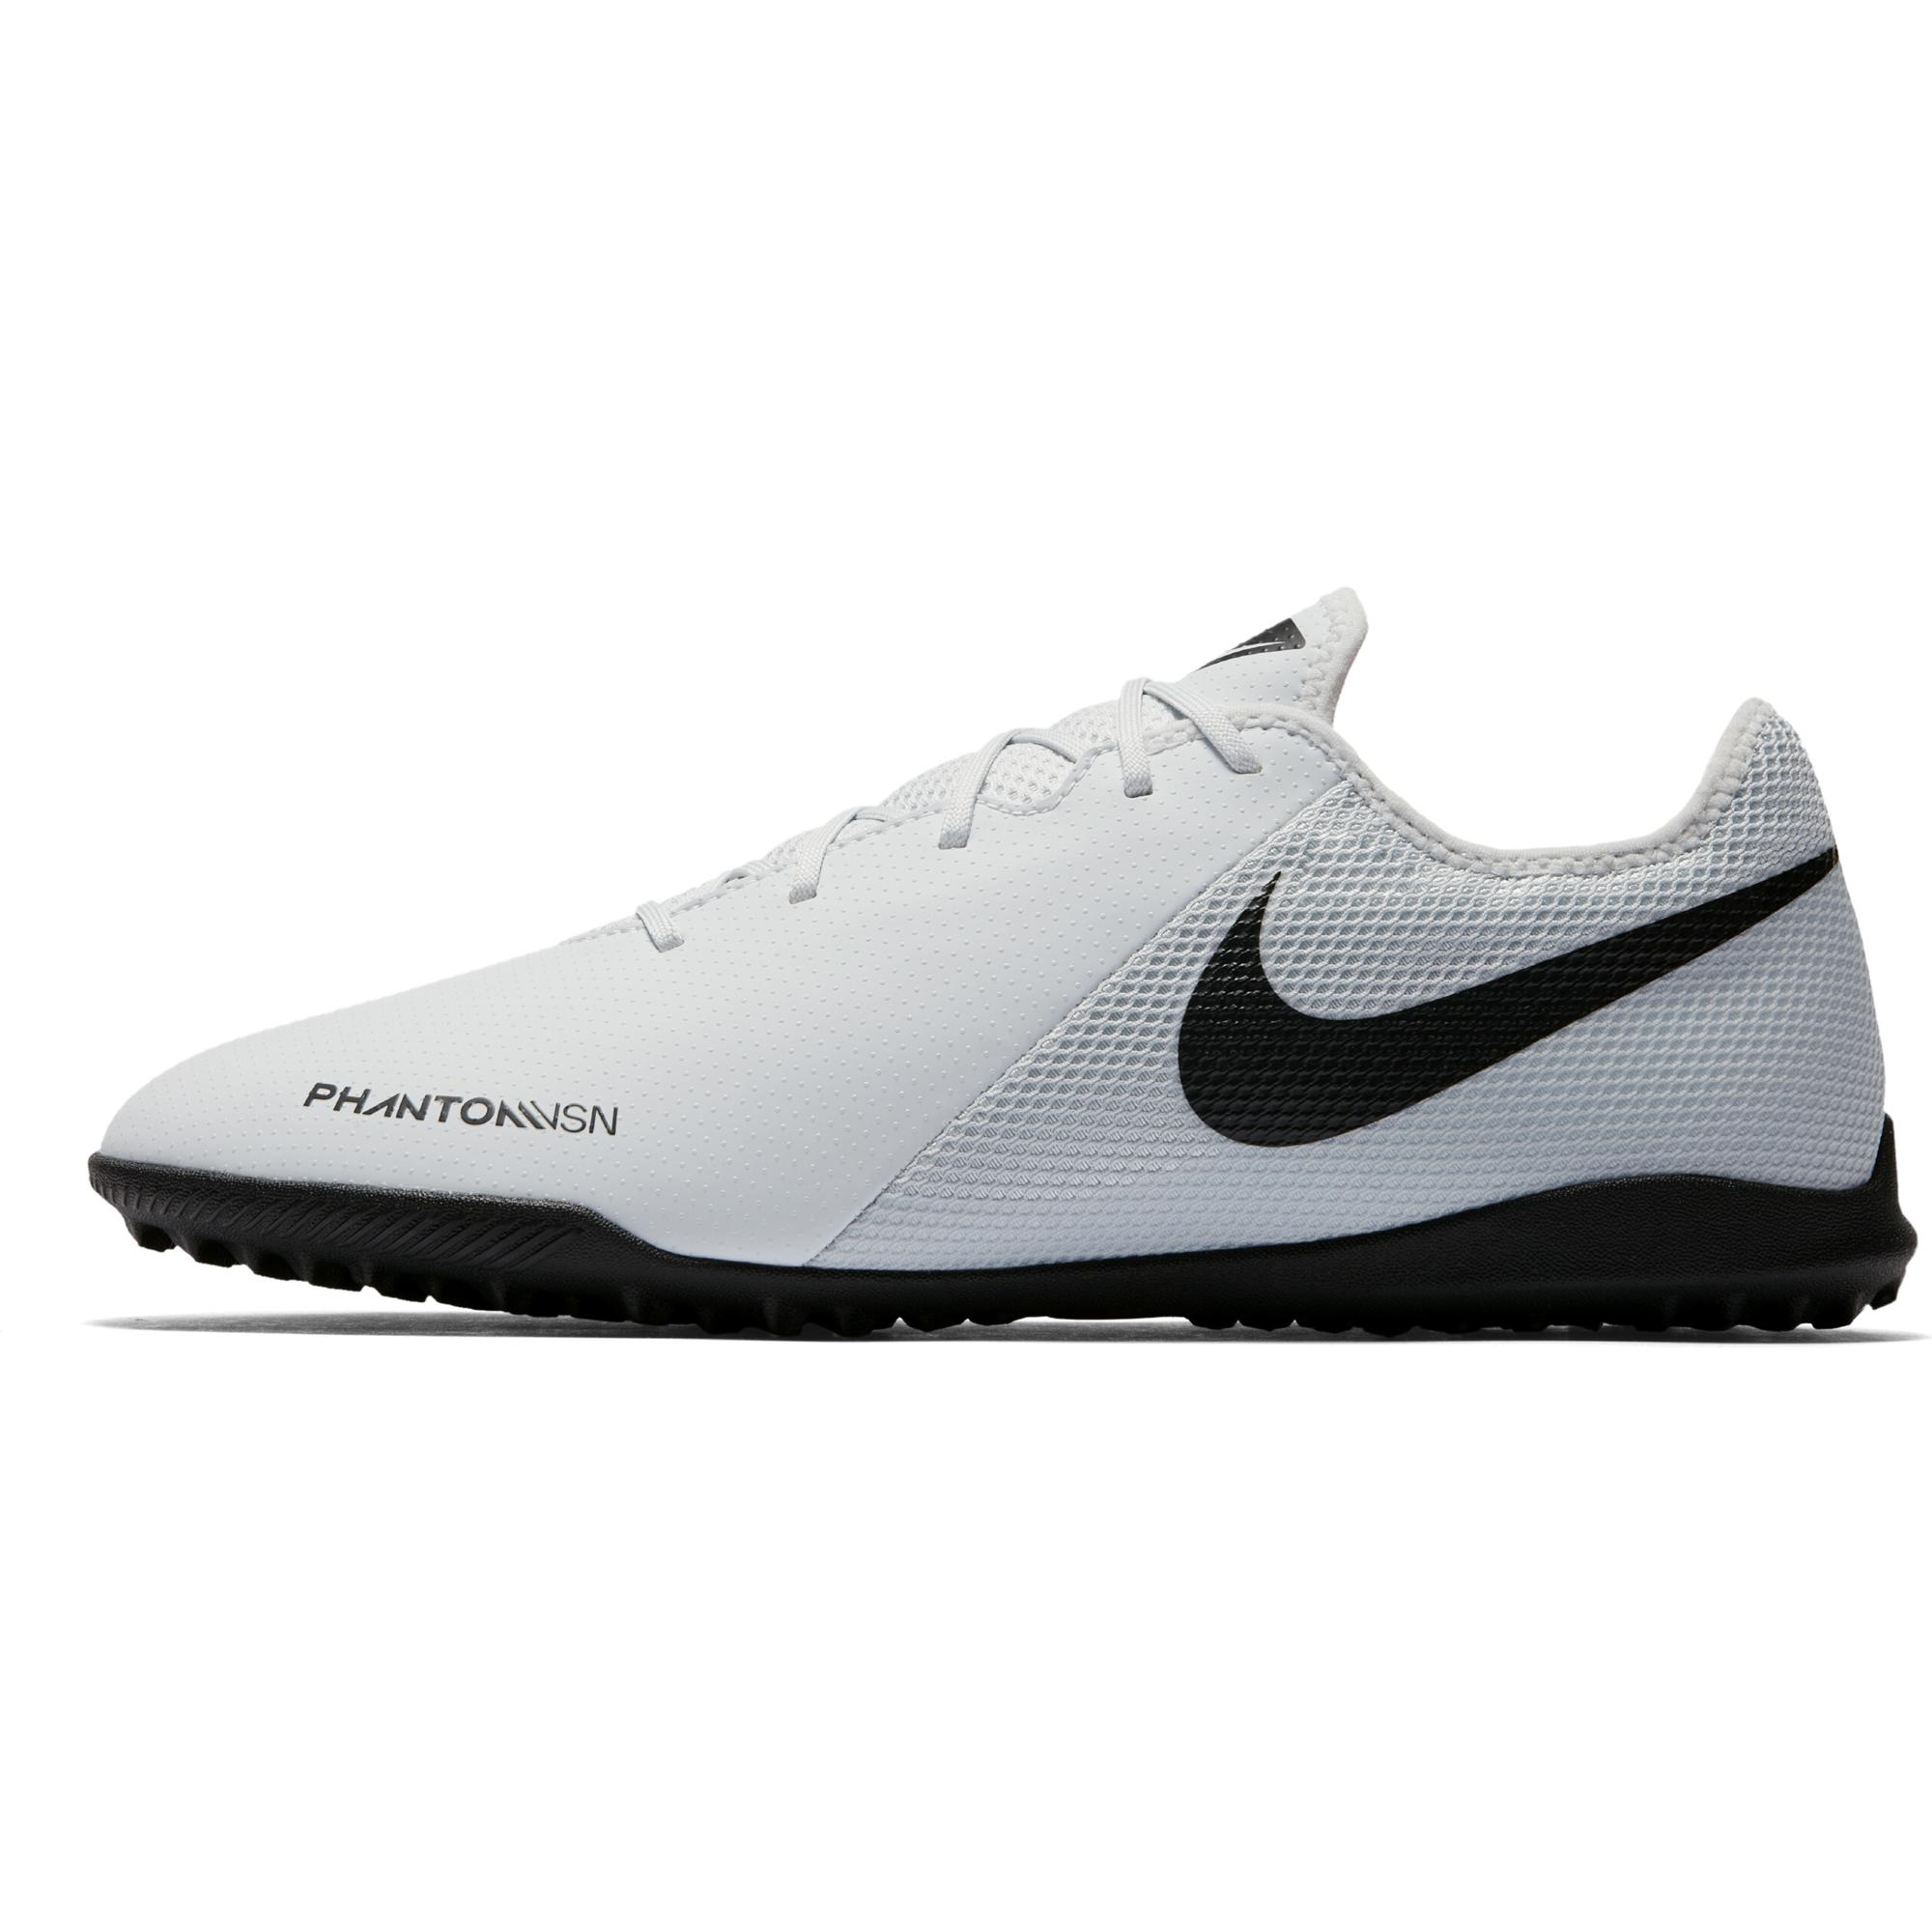 VSN TF shoes Nike Futsal ACADEMY PHANTOM OiPXTkZu